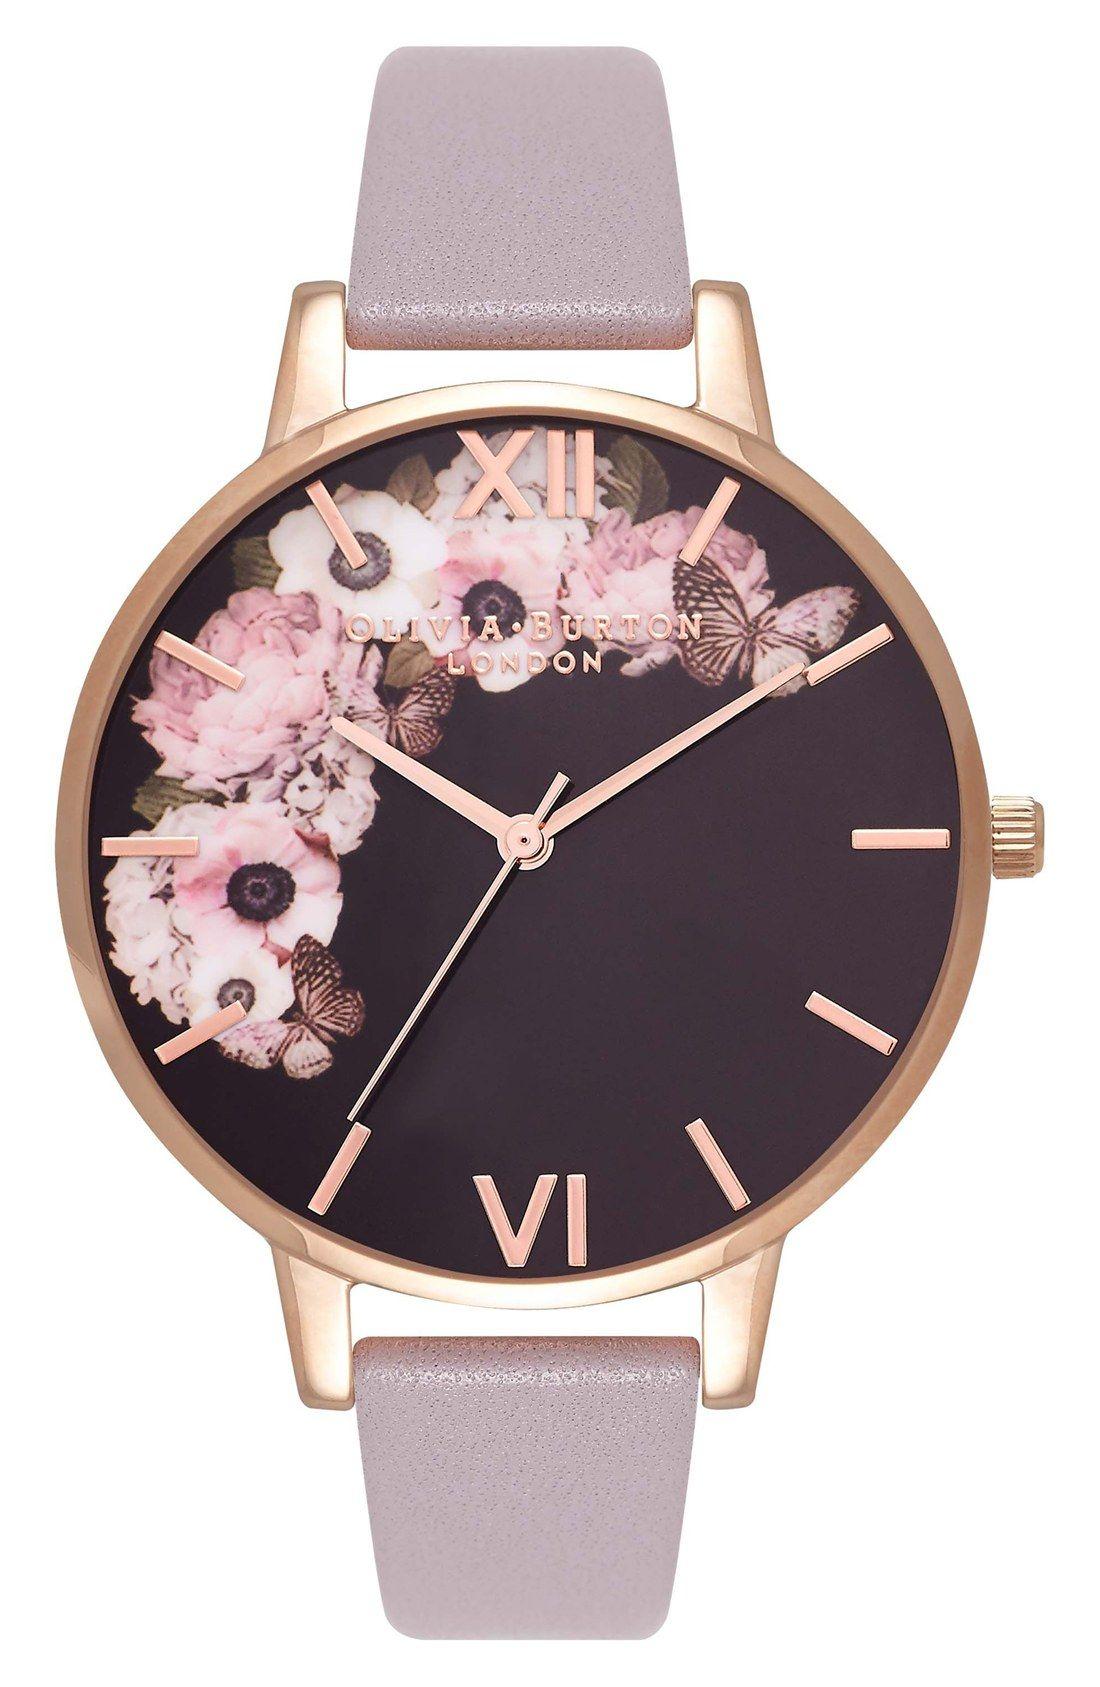 Olivia Burton Winter Garden Leather Strap Watch 13fe437073f6